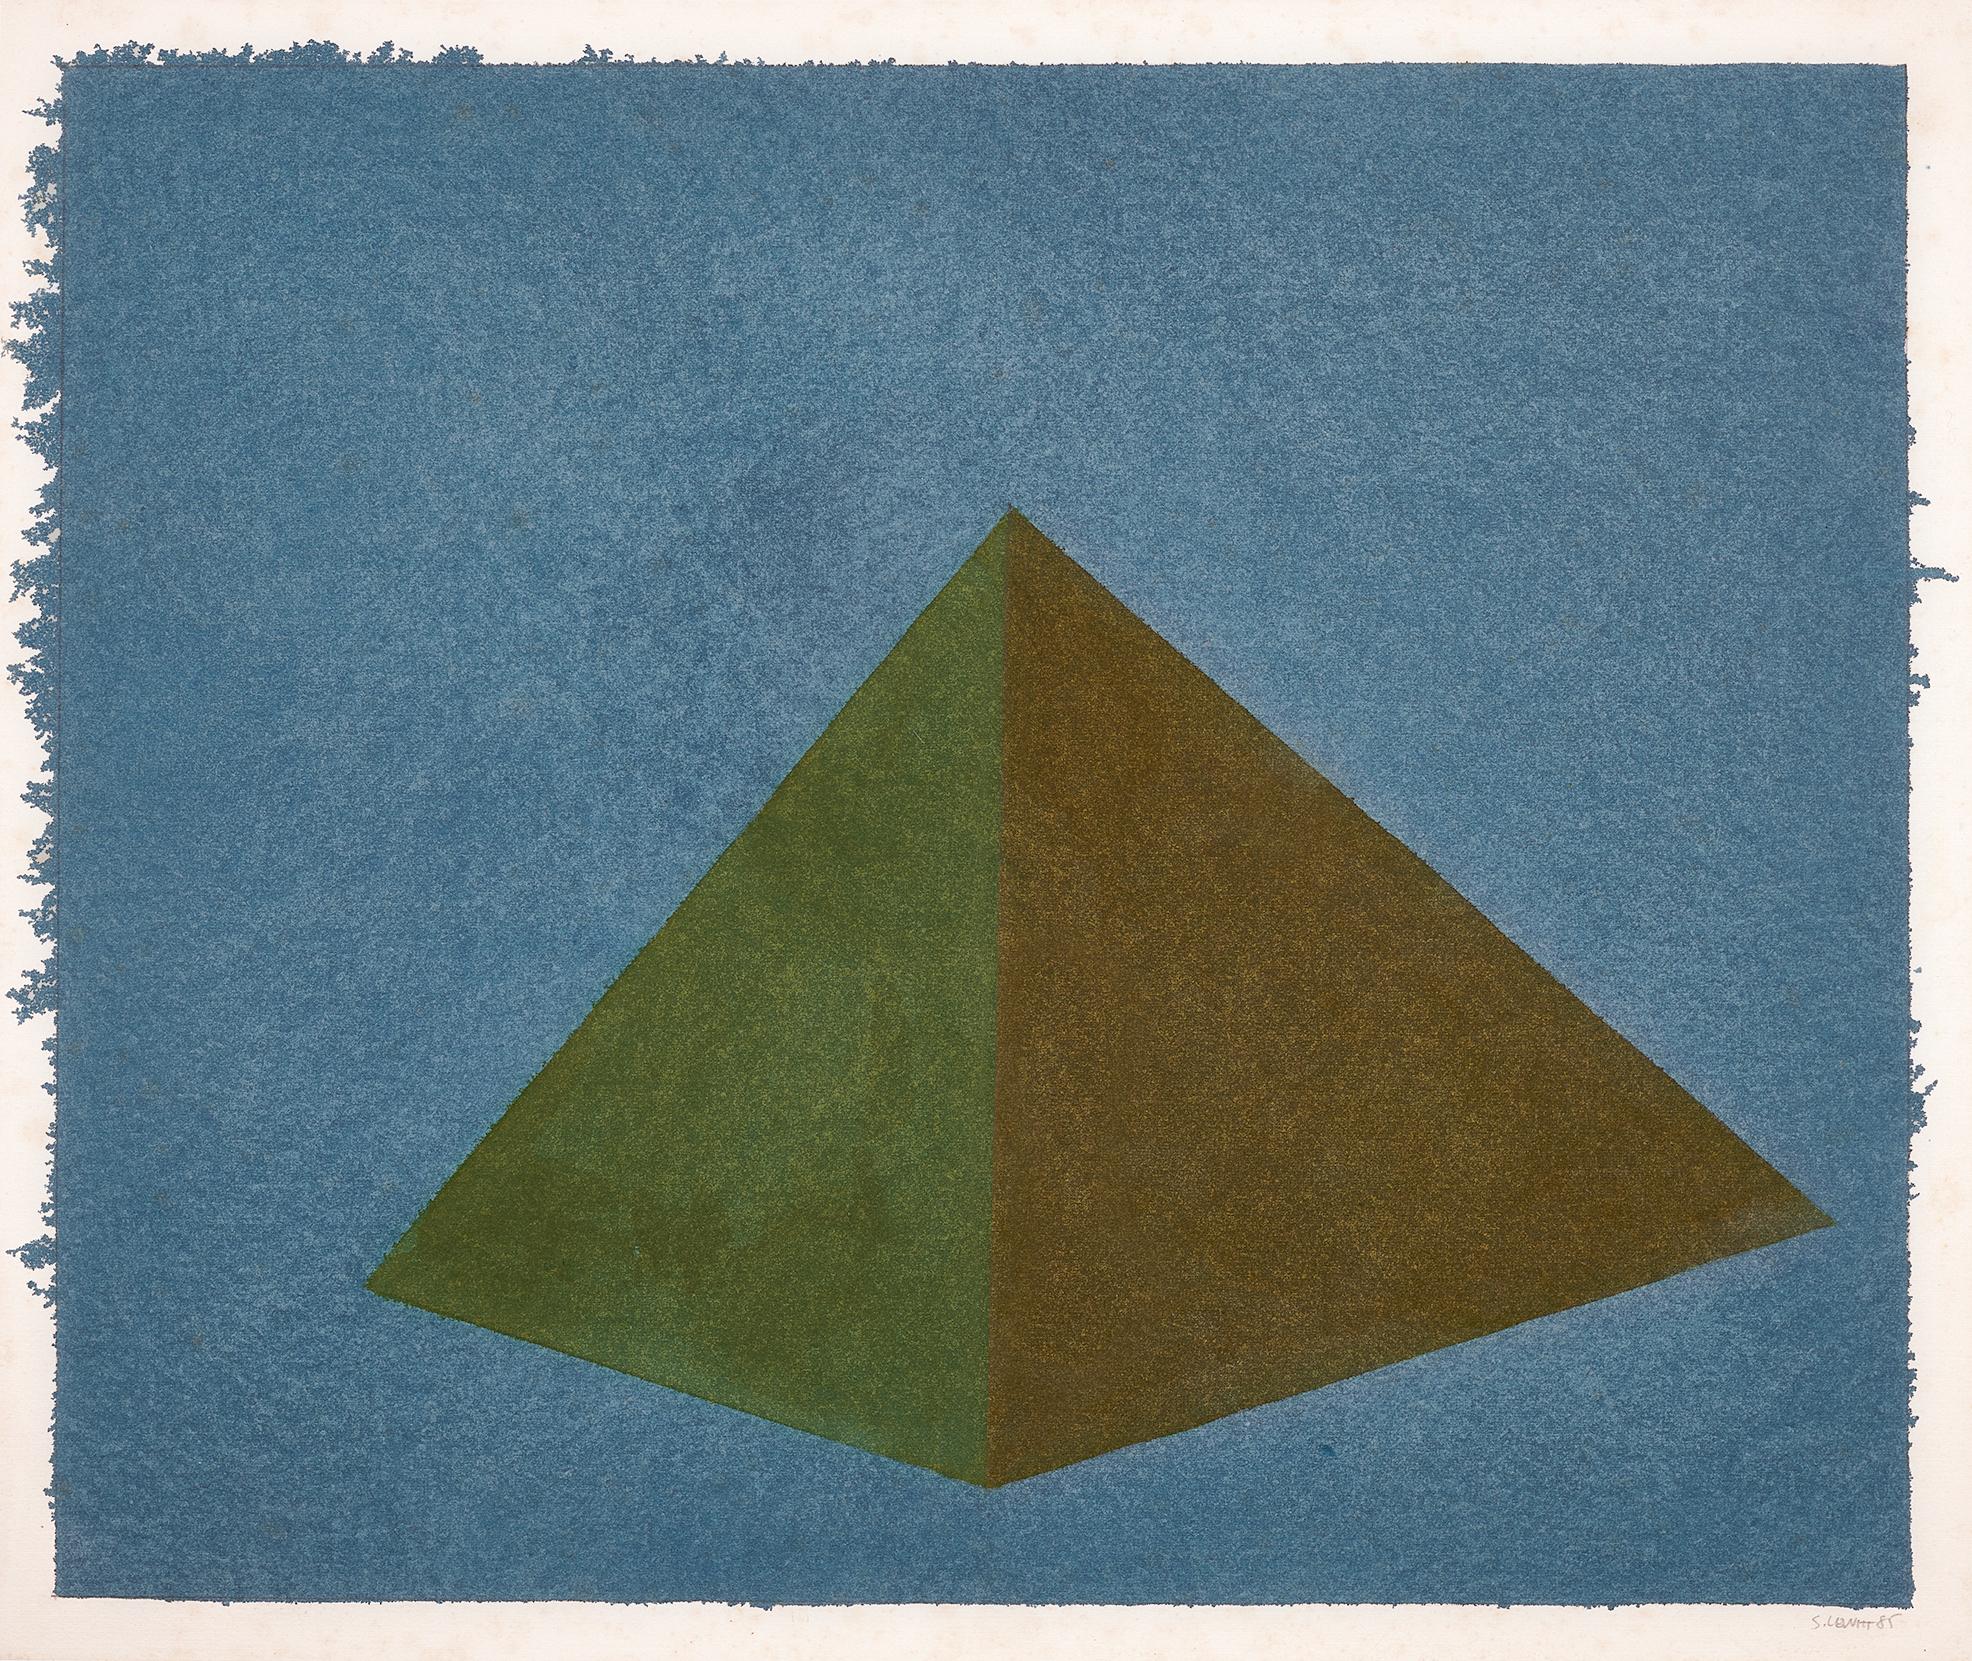 LeWitt Sol, Pyramid